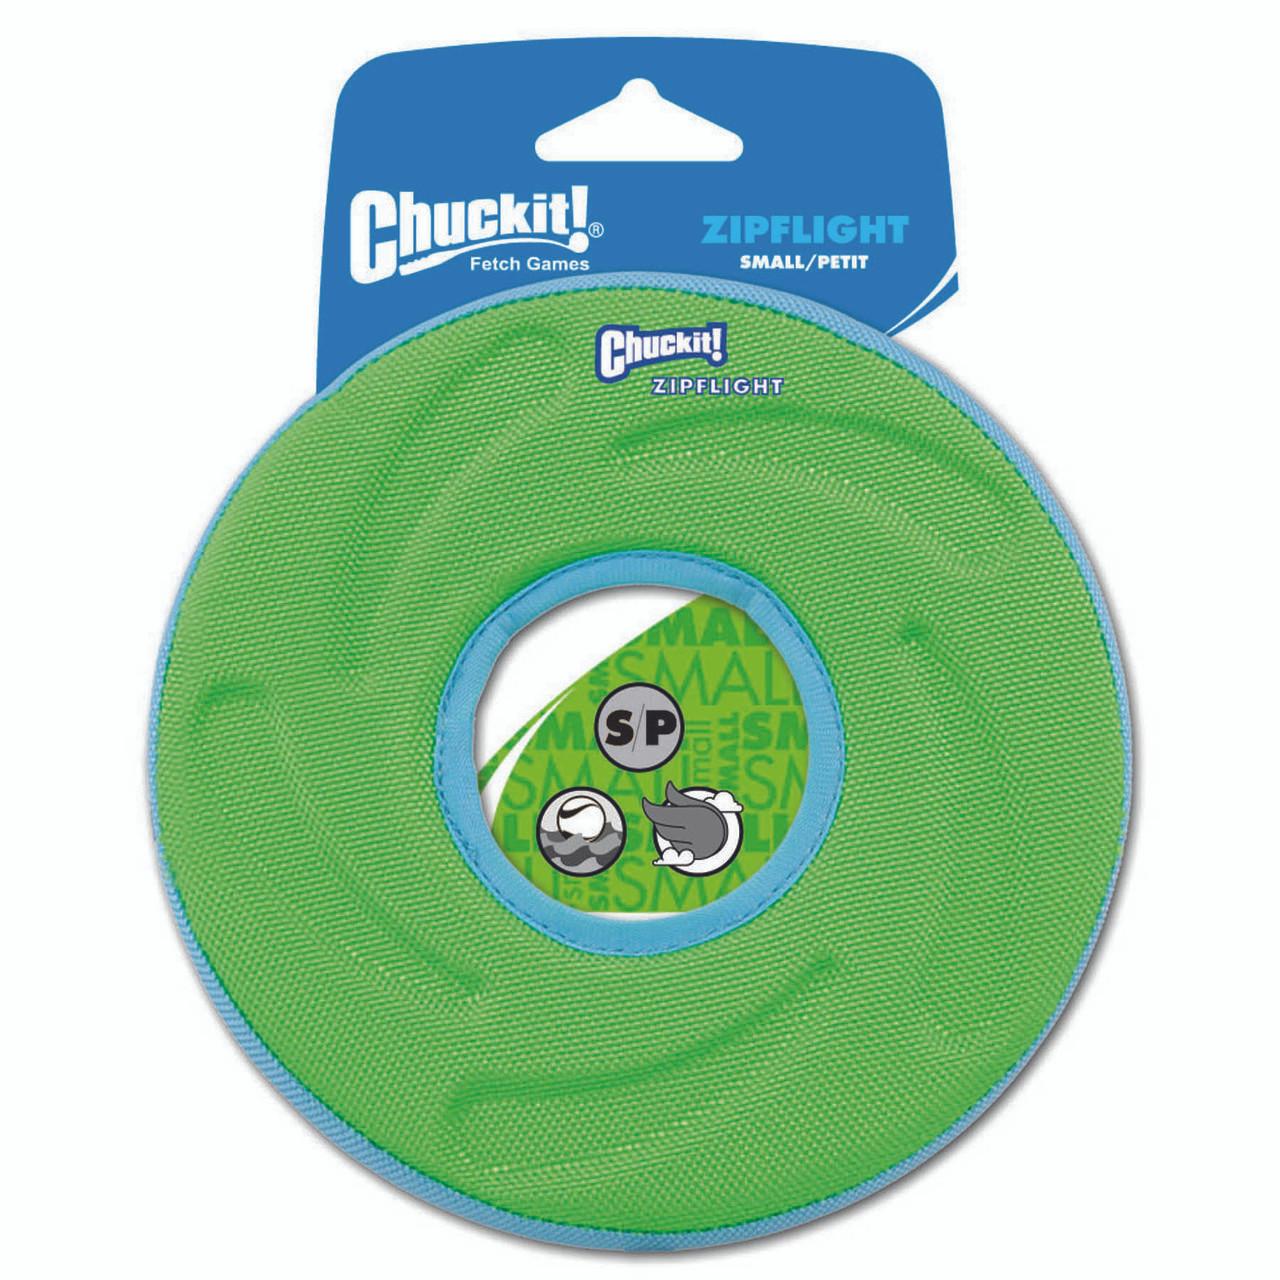 Chuckit! Zipflight Fetch Dog Toy